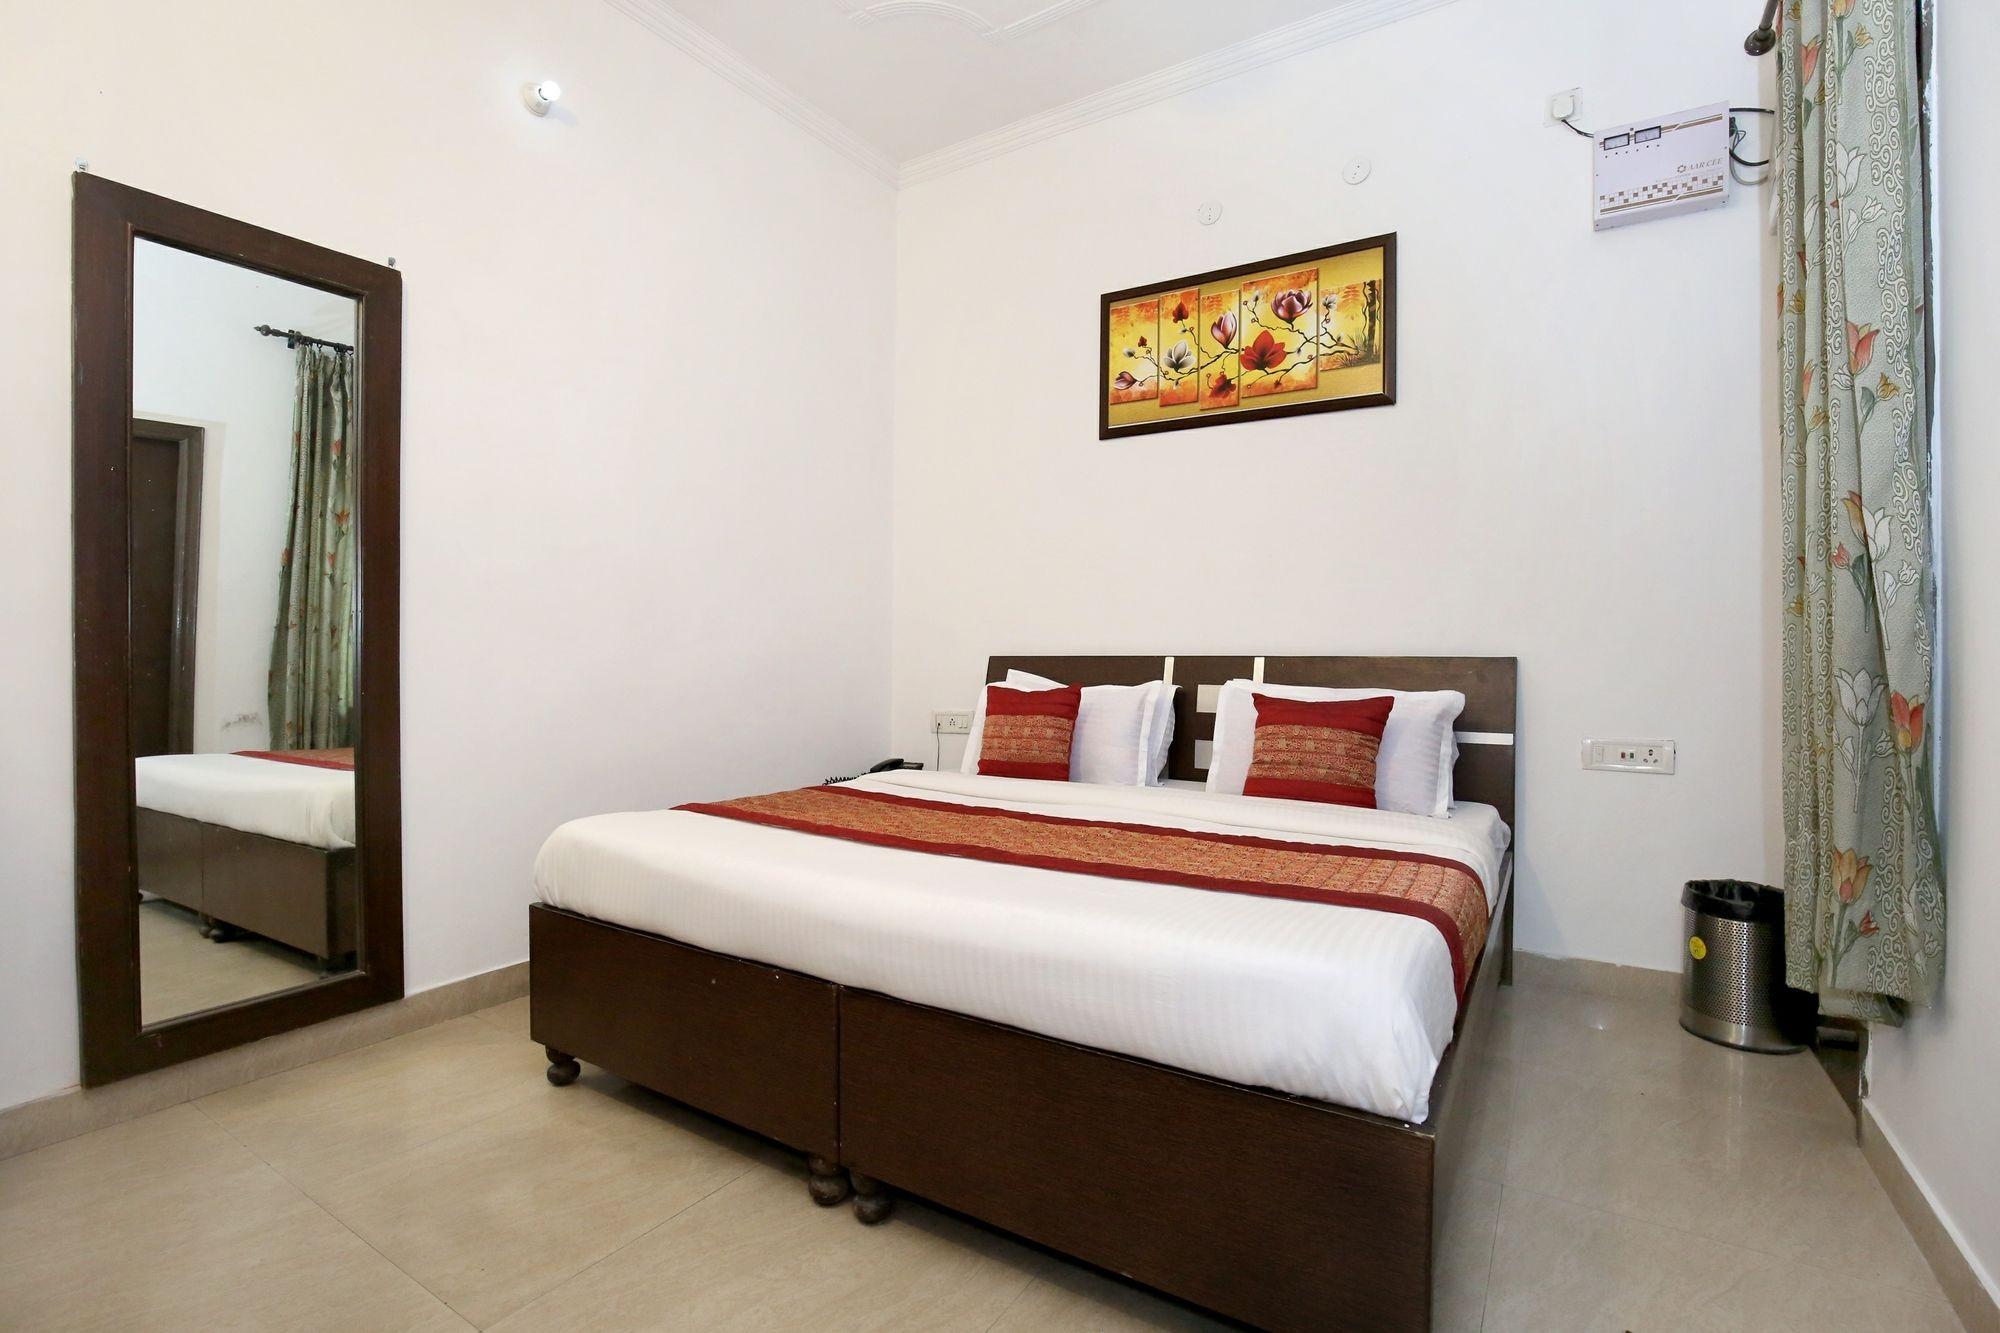 Gallery image of OYO 9657 Hotel Sham Villa